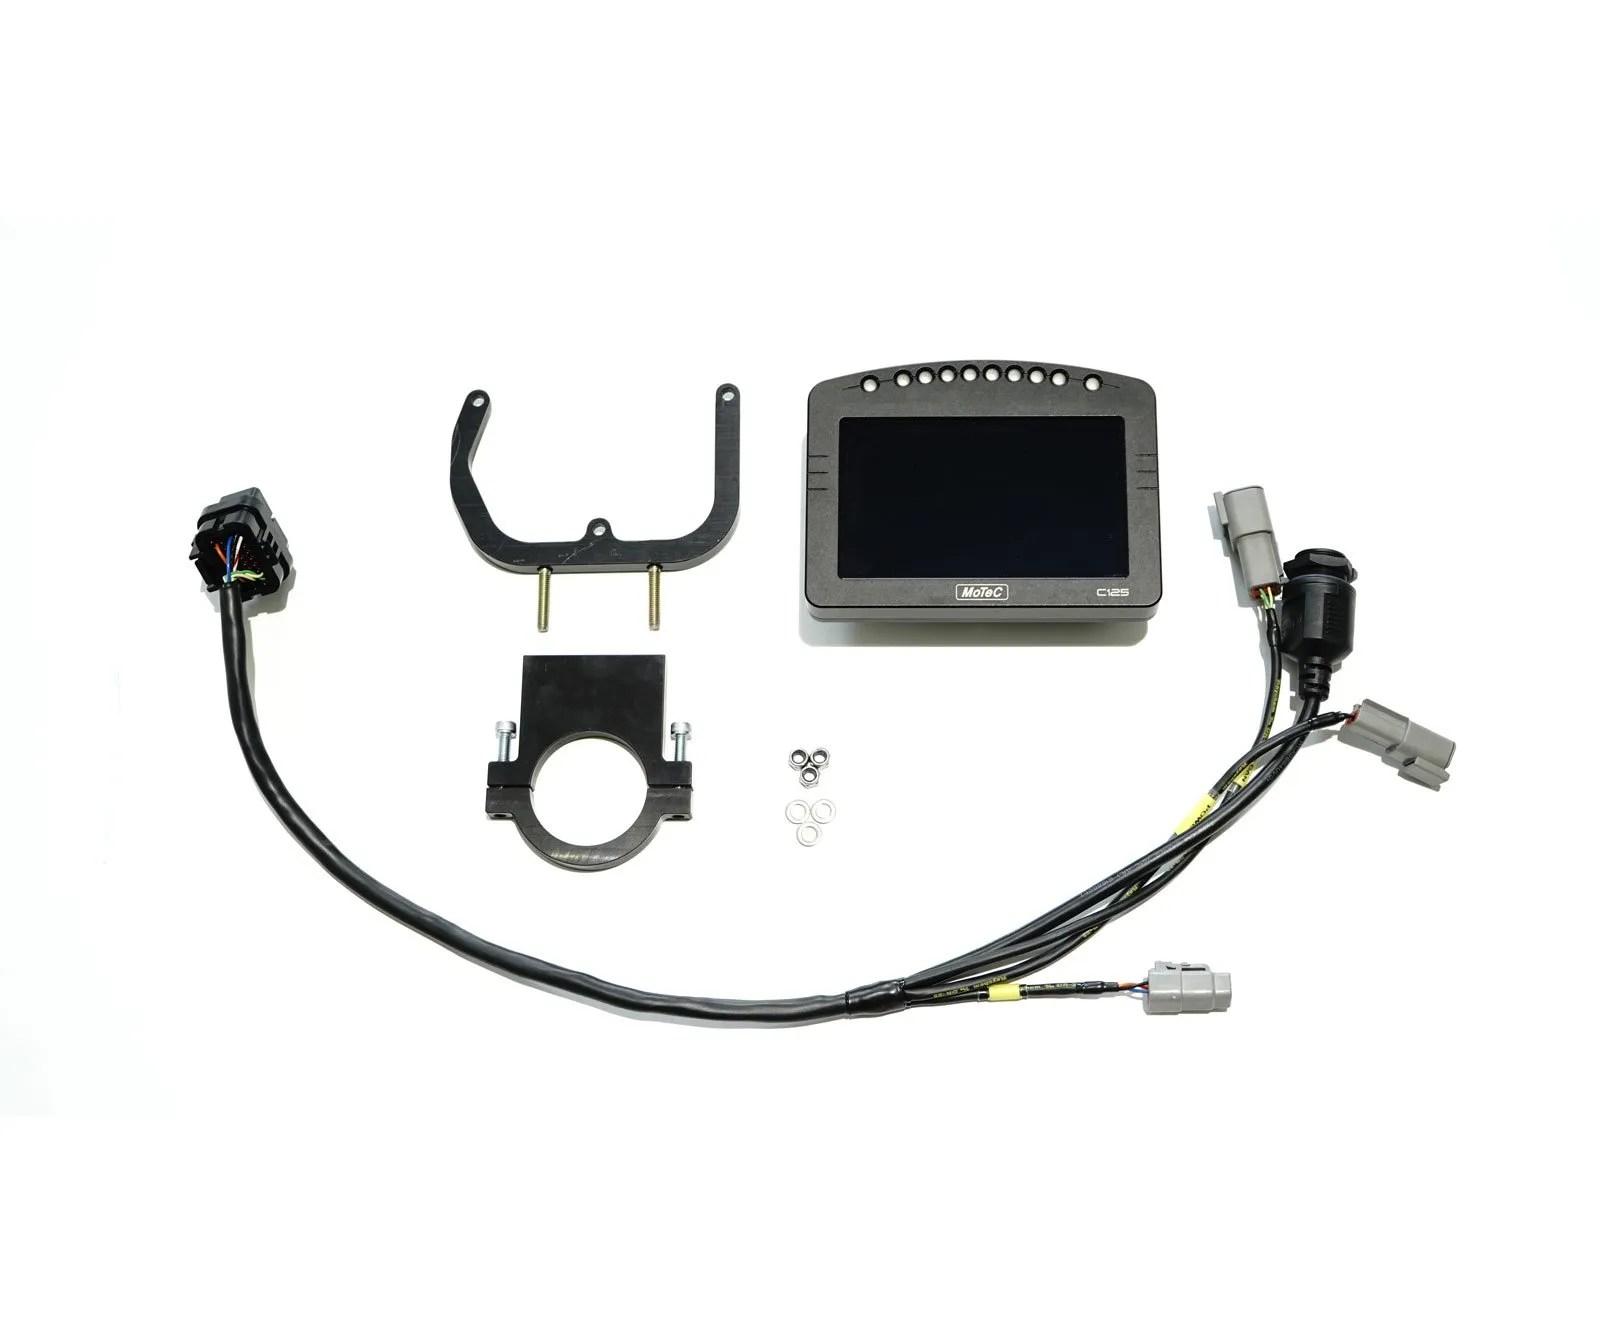 MPP MoTeC C125 Display For Model 3